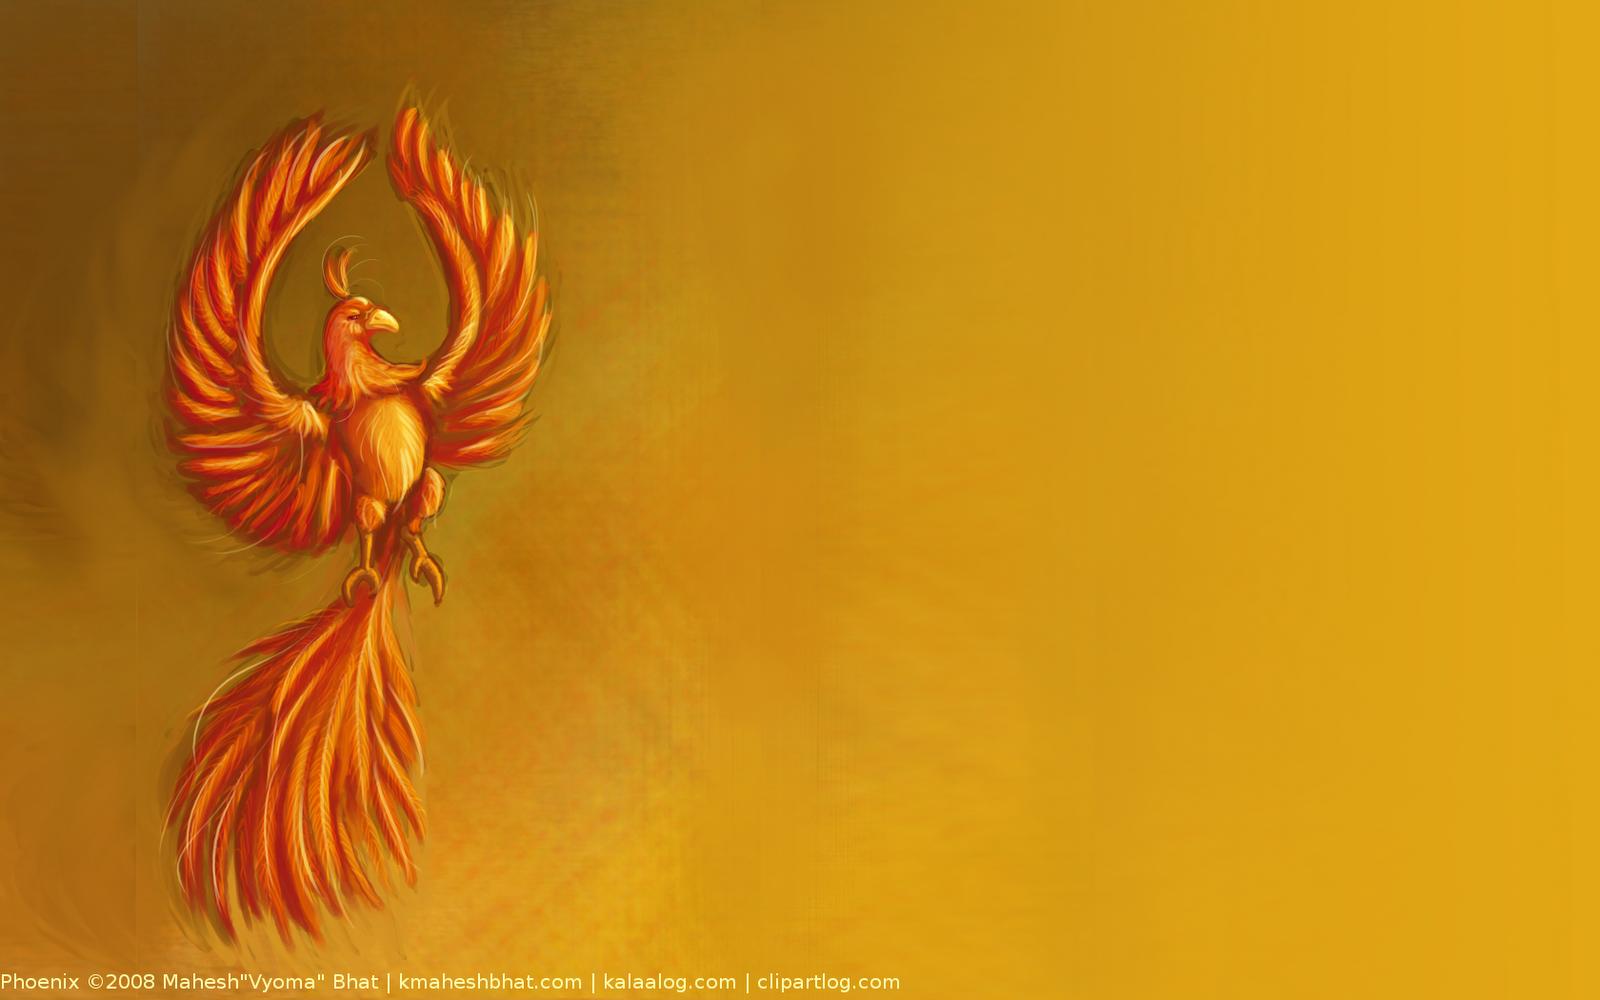 phoenix wallpaper wallpaper for desktop